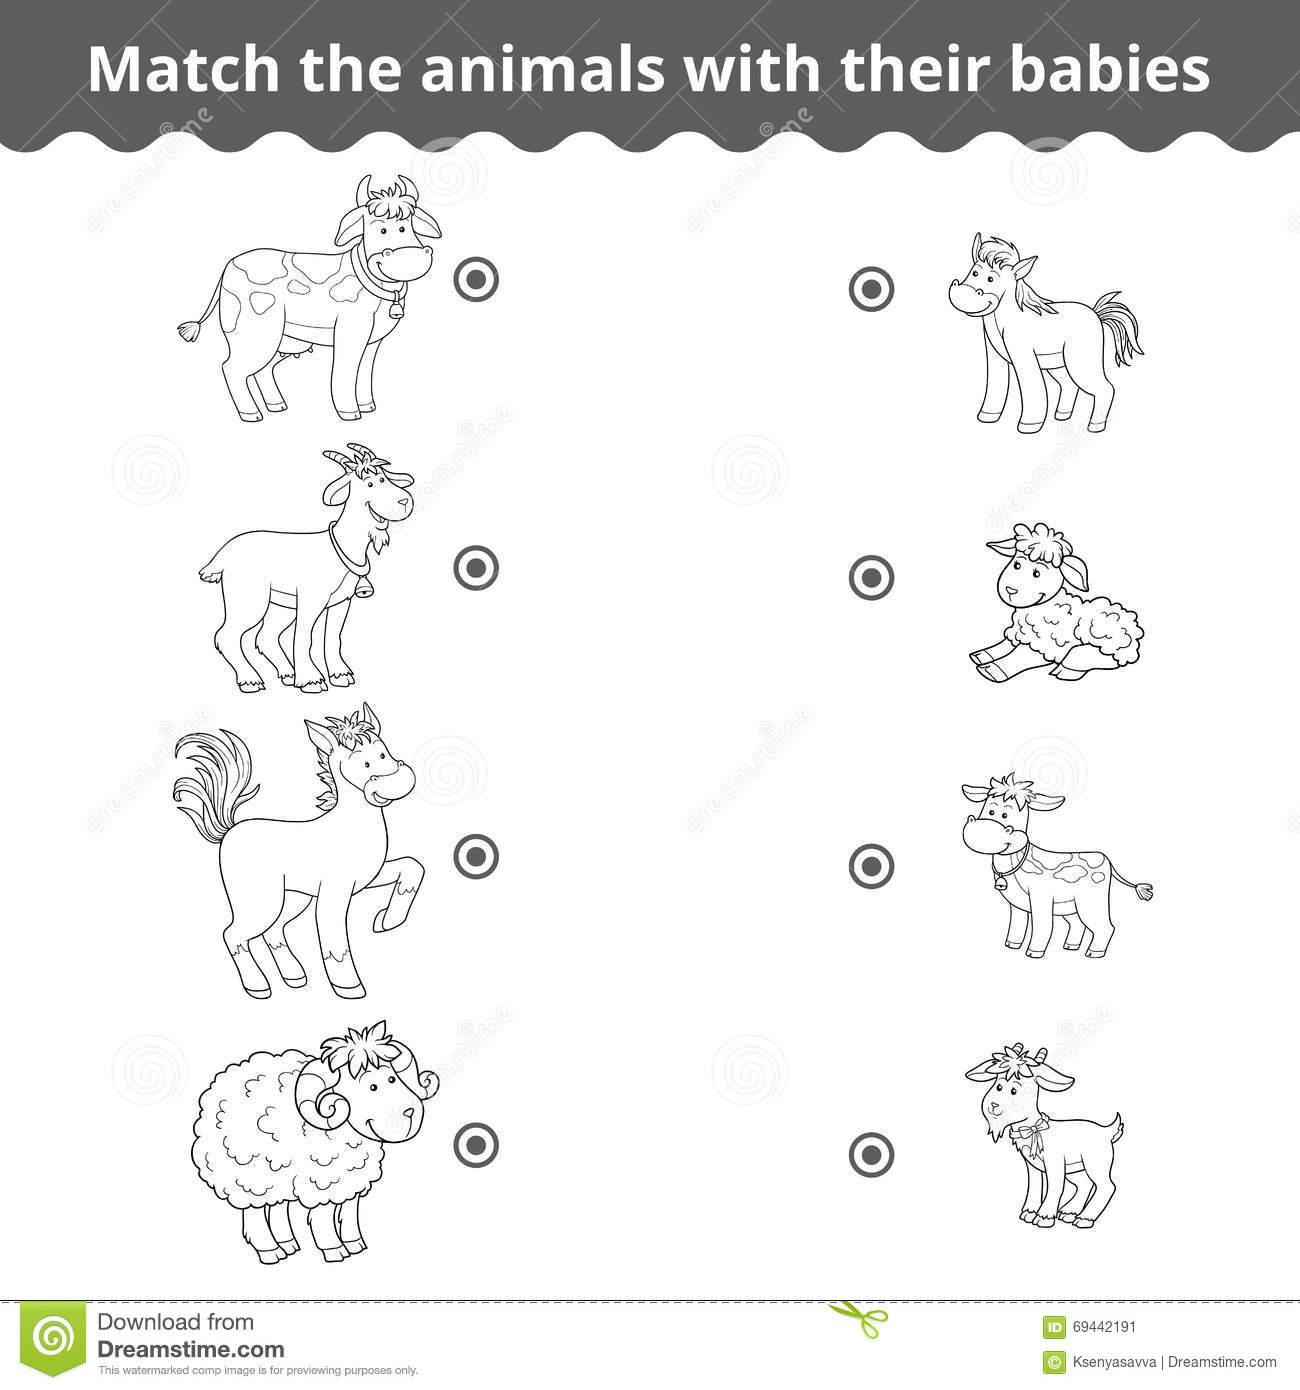 Kindergarten Matching Game For Children, Farm Animals And Babies